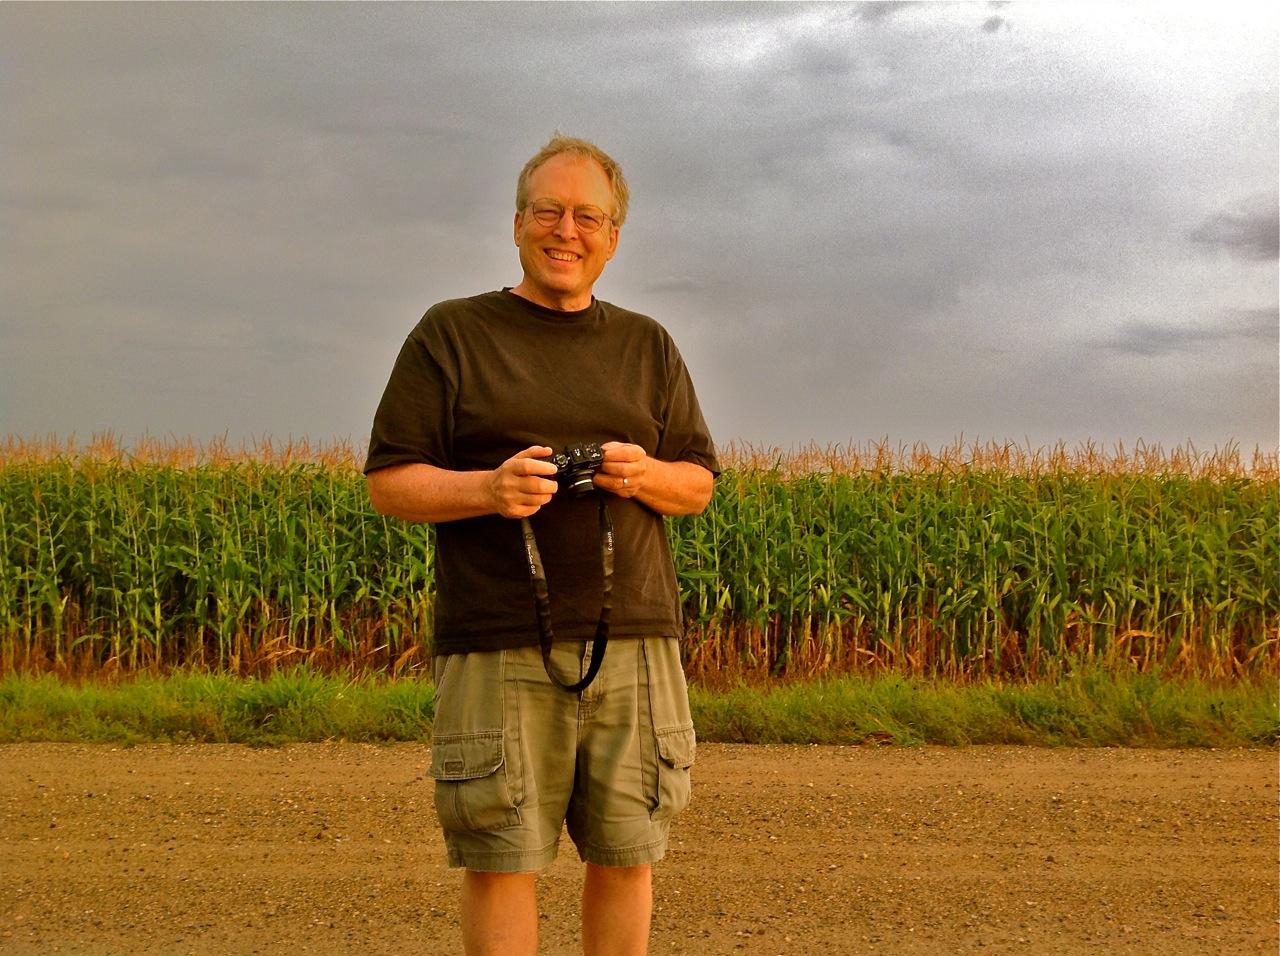 IMG_2565 Mike Hazard Osakis corn field by Tressa Sularz.jpg